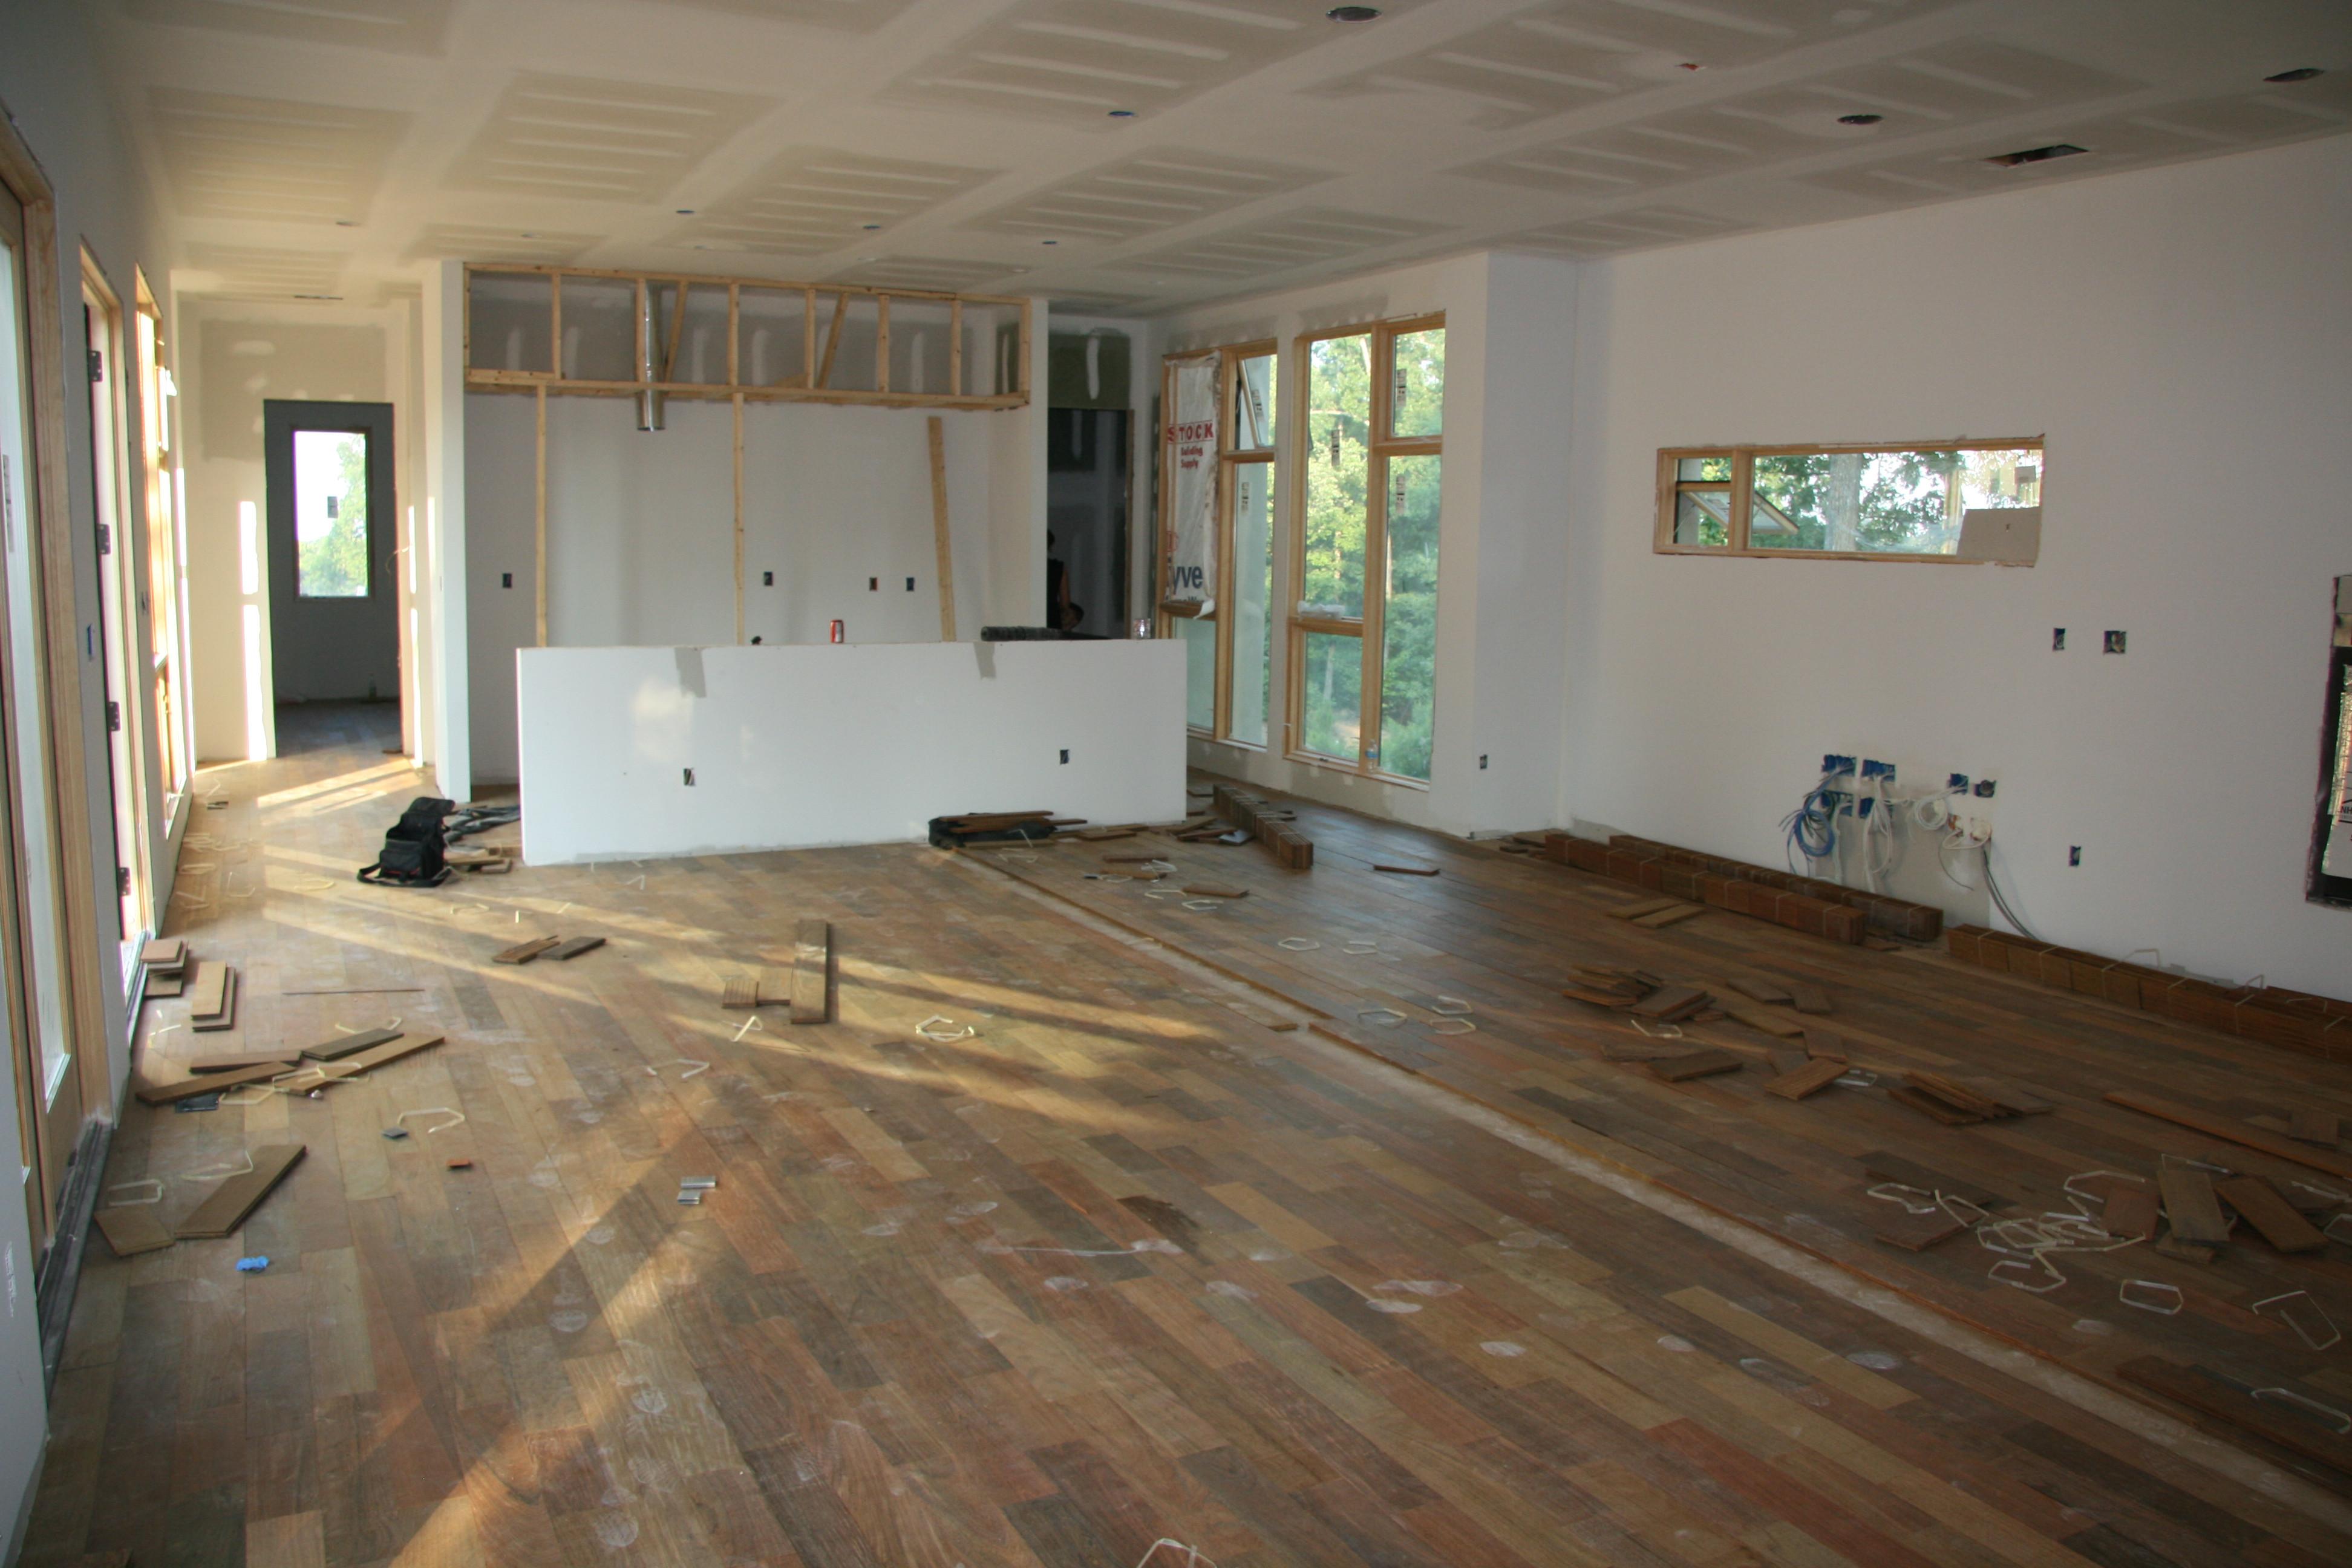 hardwood floor refinishing raleigh of floor refinishing company hardwood floors service by cris floor inside floor refinishing company raleigh nc hardwood flooring sanding installation and refinishing